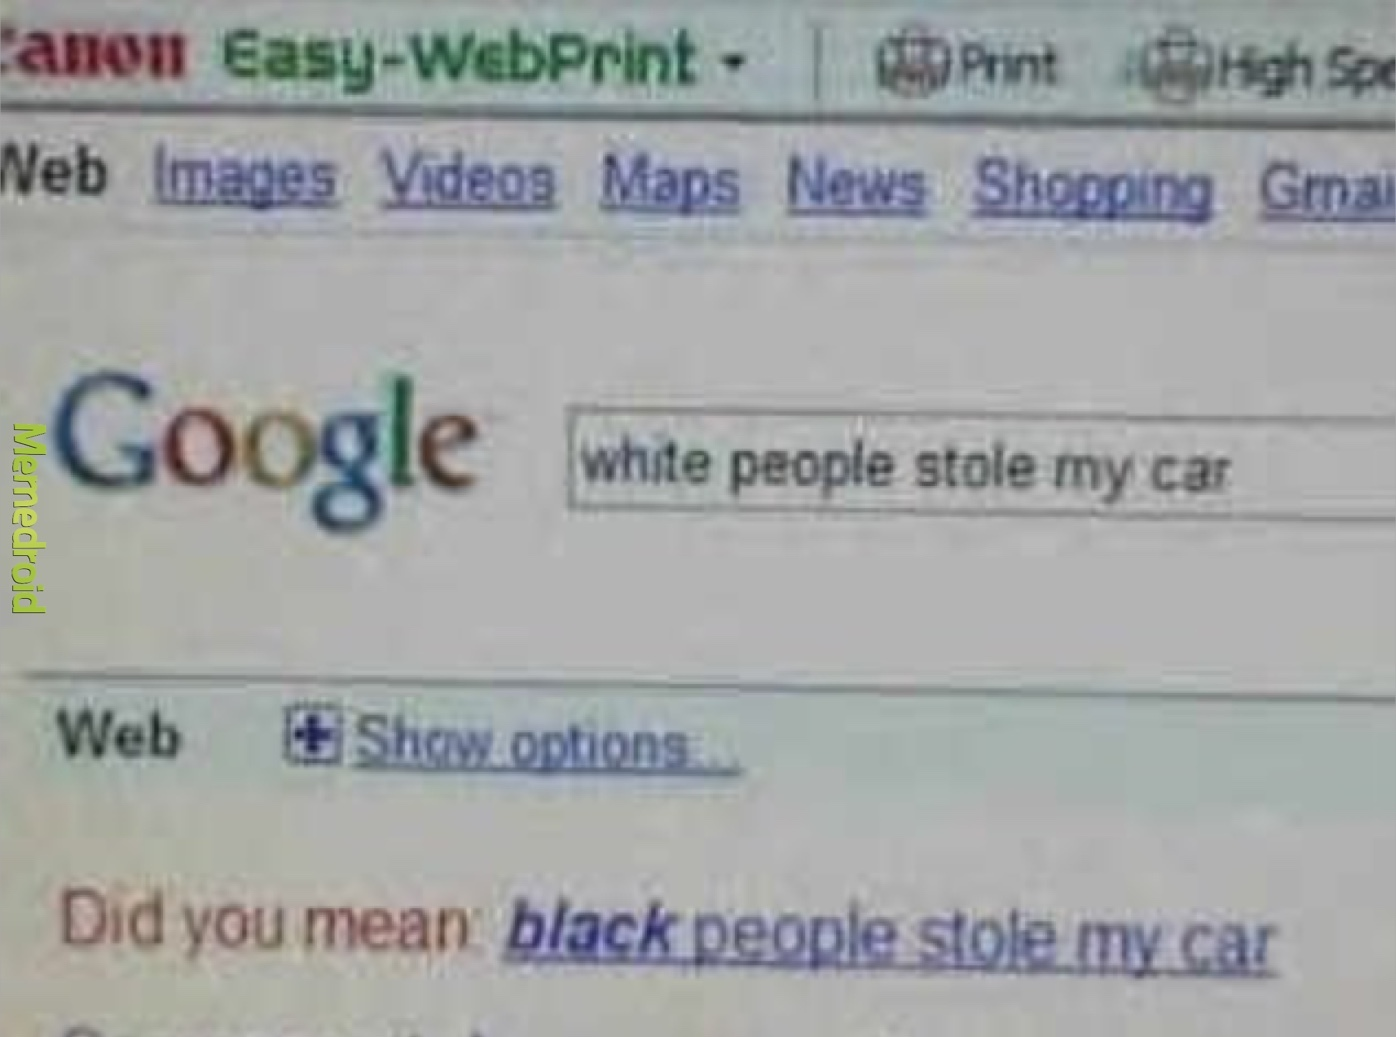 Google is racist! - meme